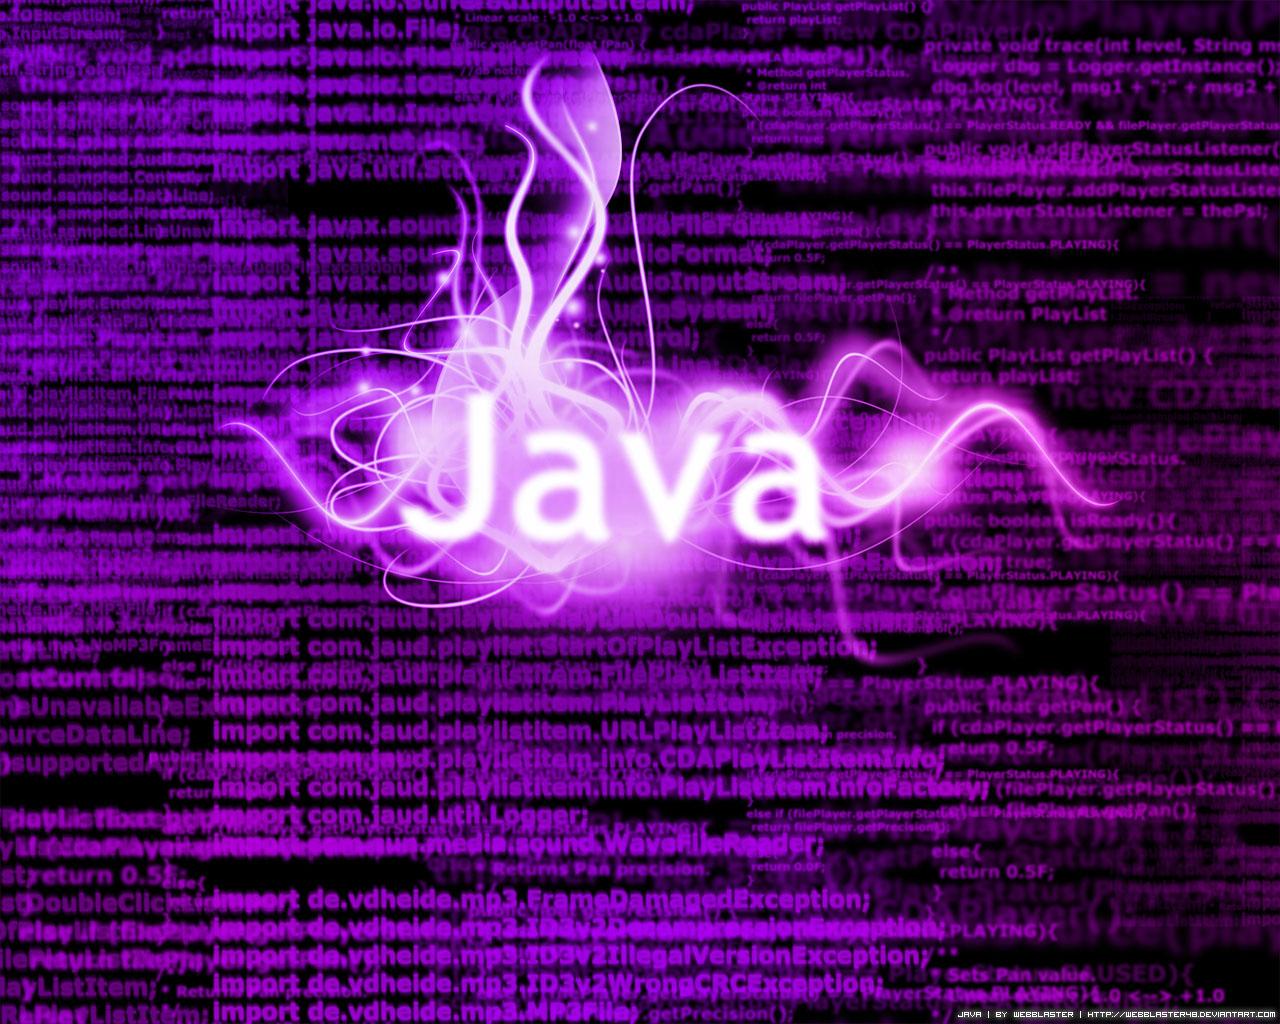 Java Coding Wallpapers Java Coding HD Wallpapers Java Coding 1280x1024